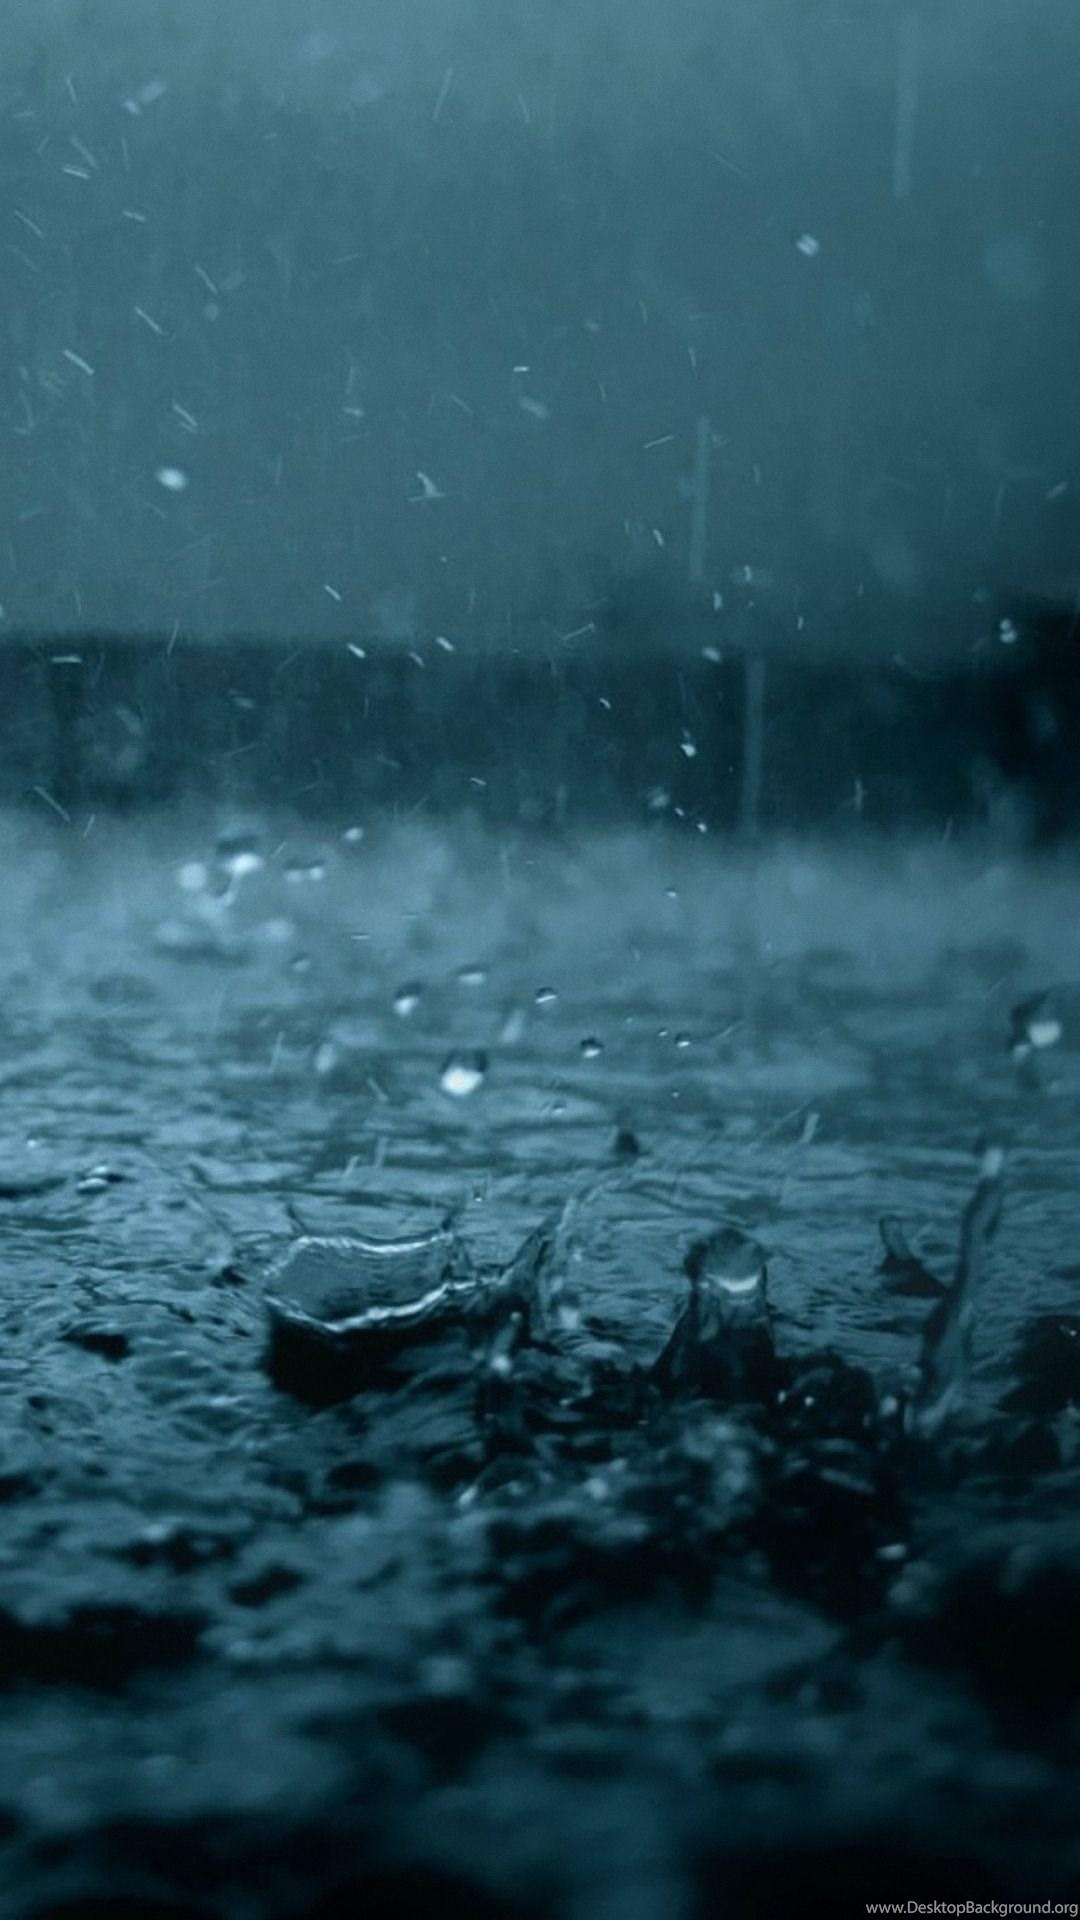 Raining Samsung Galaxy Note 3 Wallpapers Hd 1080x1920 Desktop Background